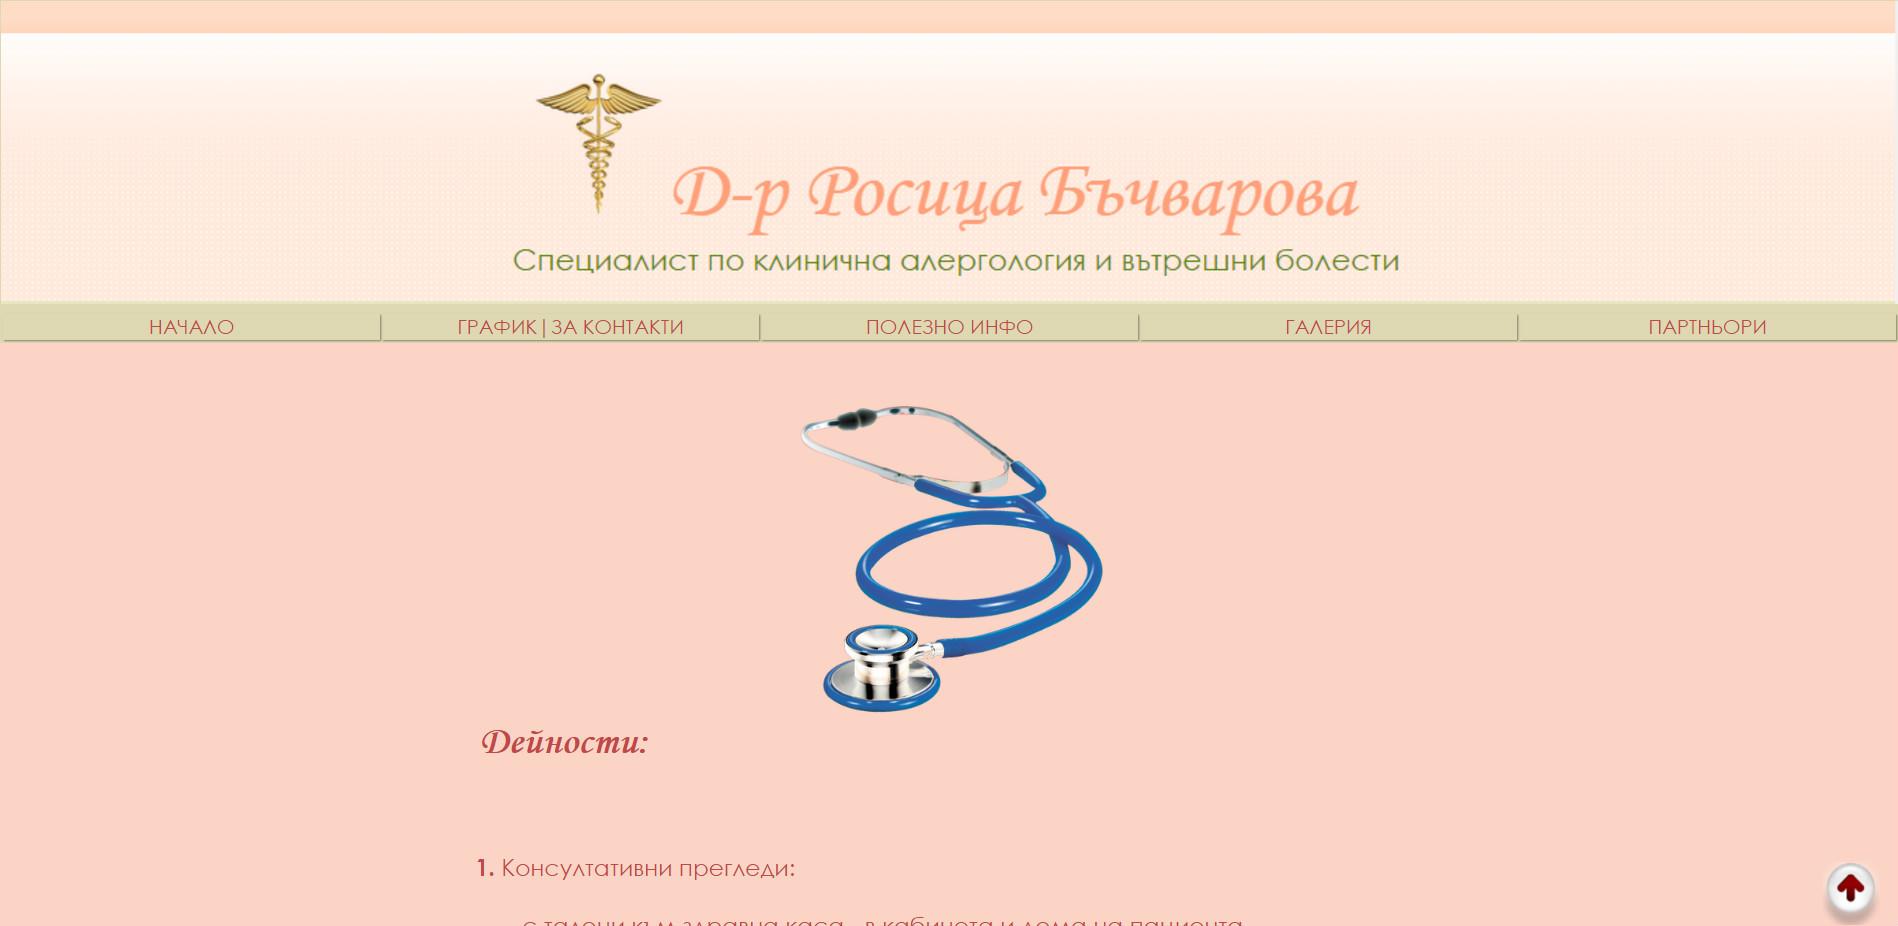 д-р Росица Бъчварова - Специалист алерголог - Русе